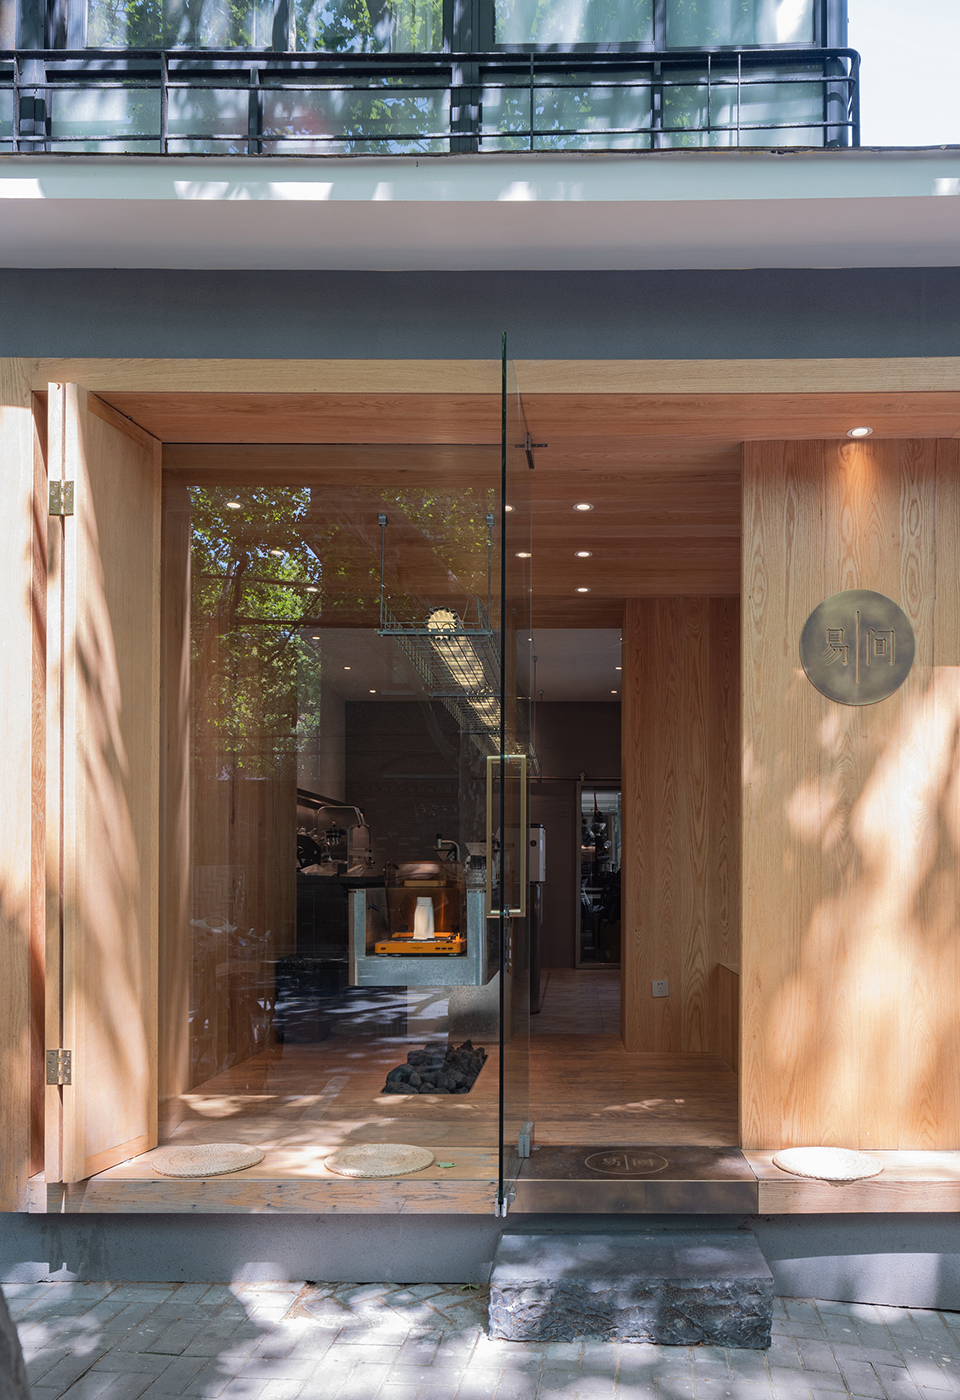 008-yijian-cafe-china-by-golucci-interior-architects.jpg